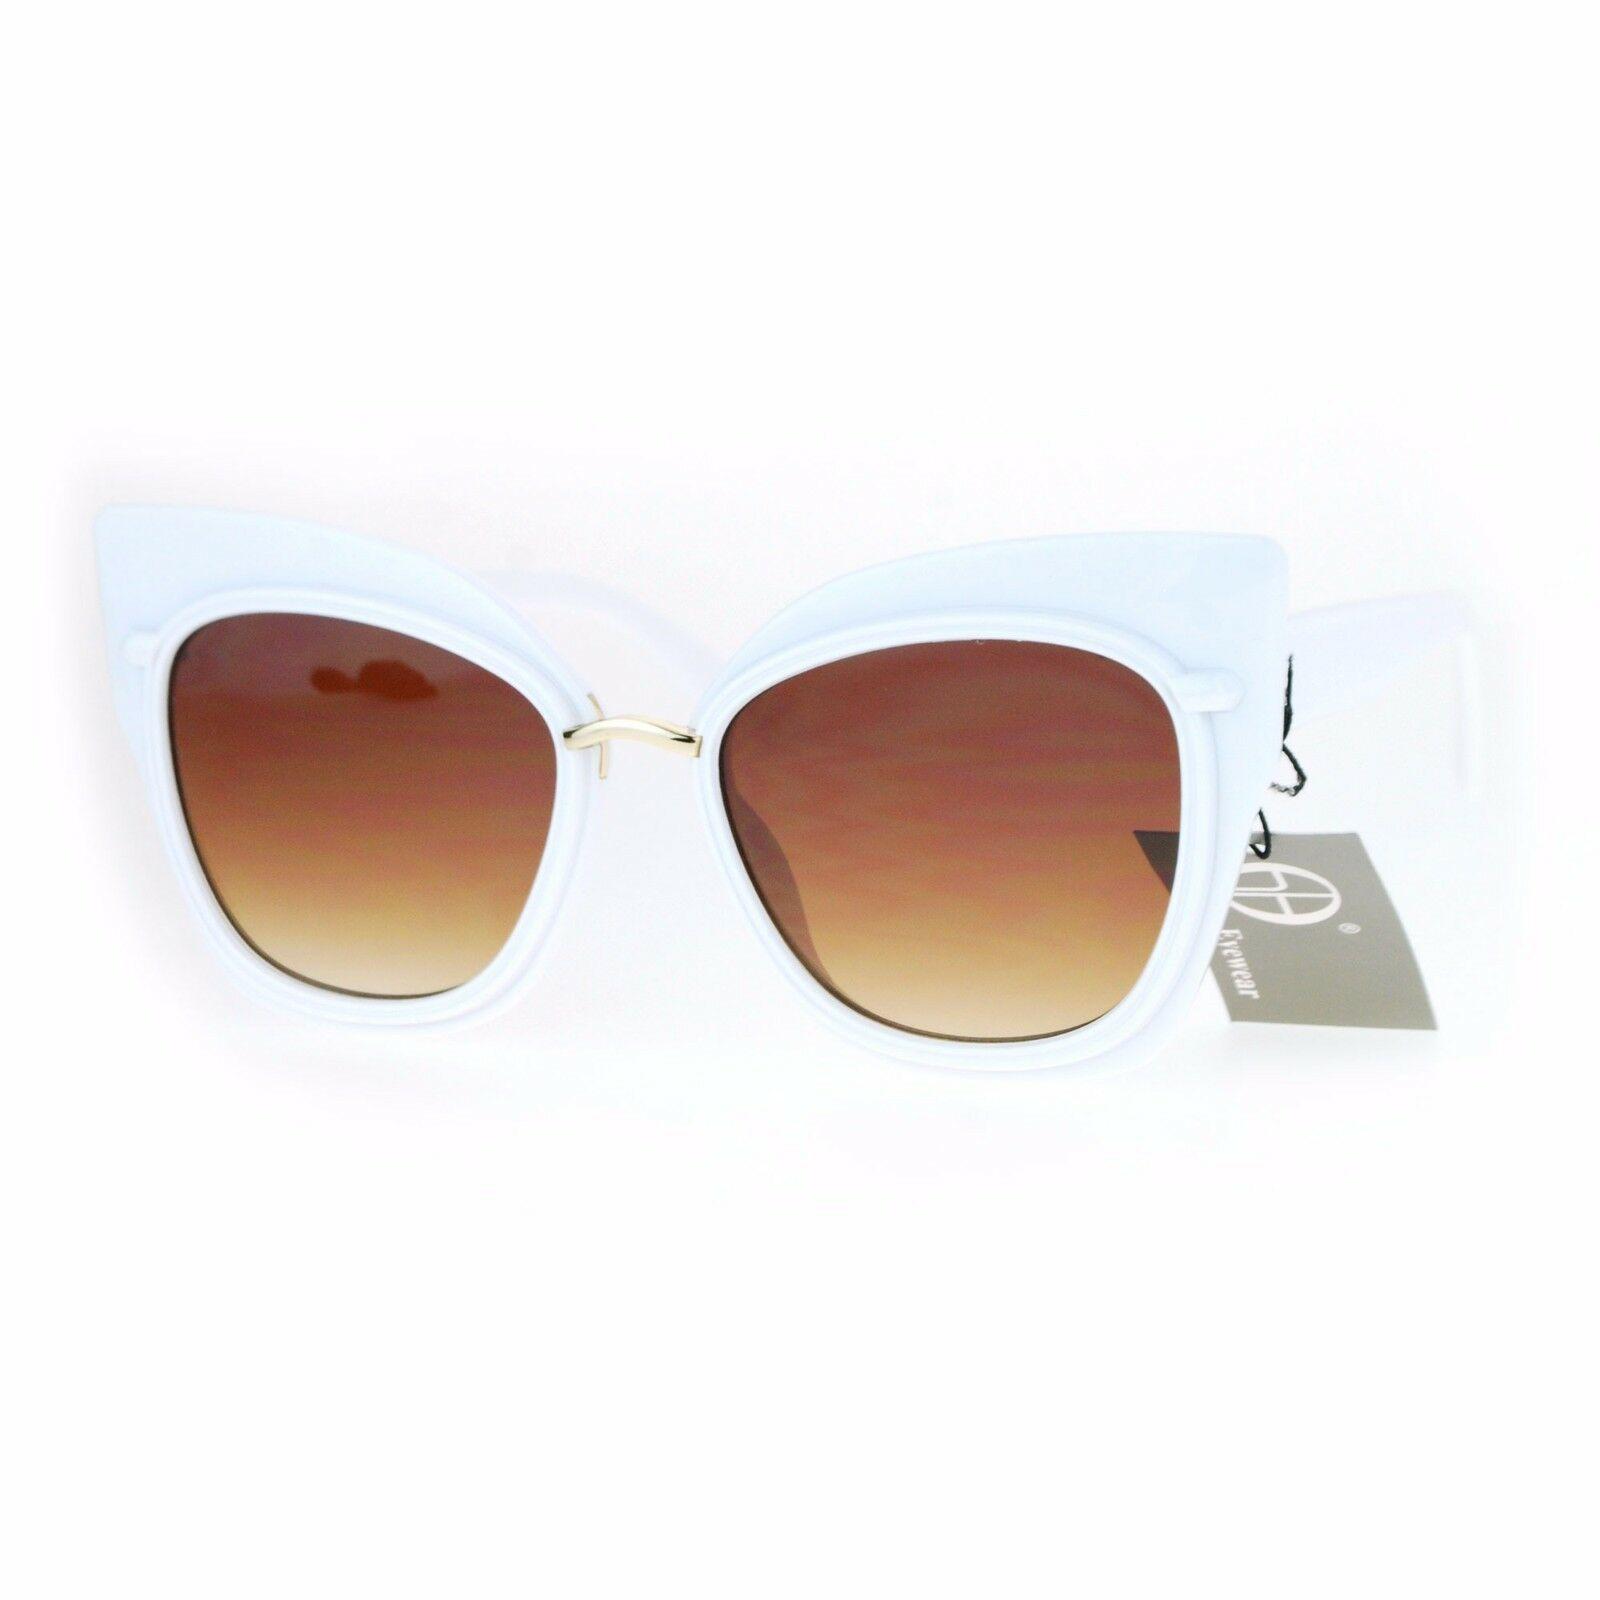 Oversized Fashion Sunglasses Womens Square Cateye Butterfly UV 400 image 4